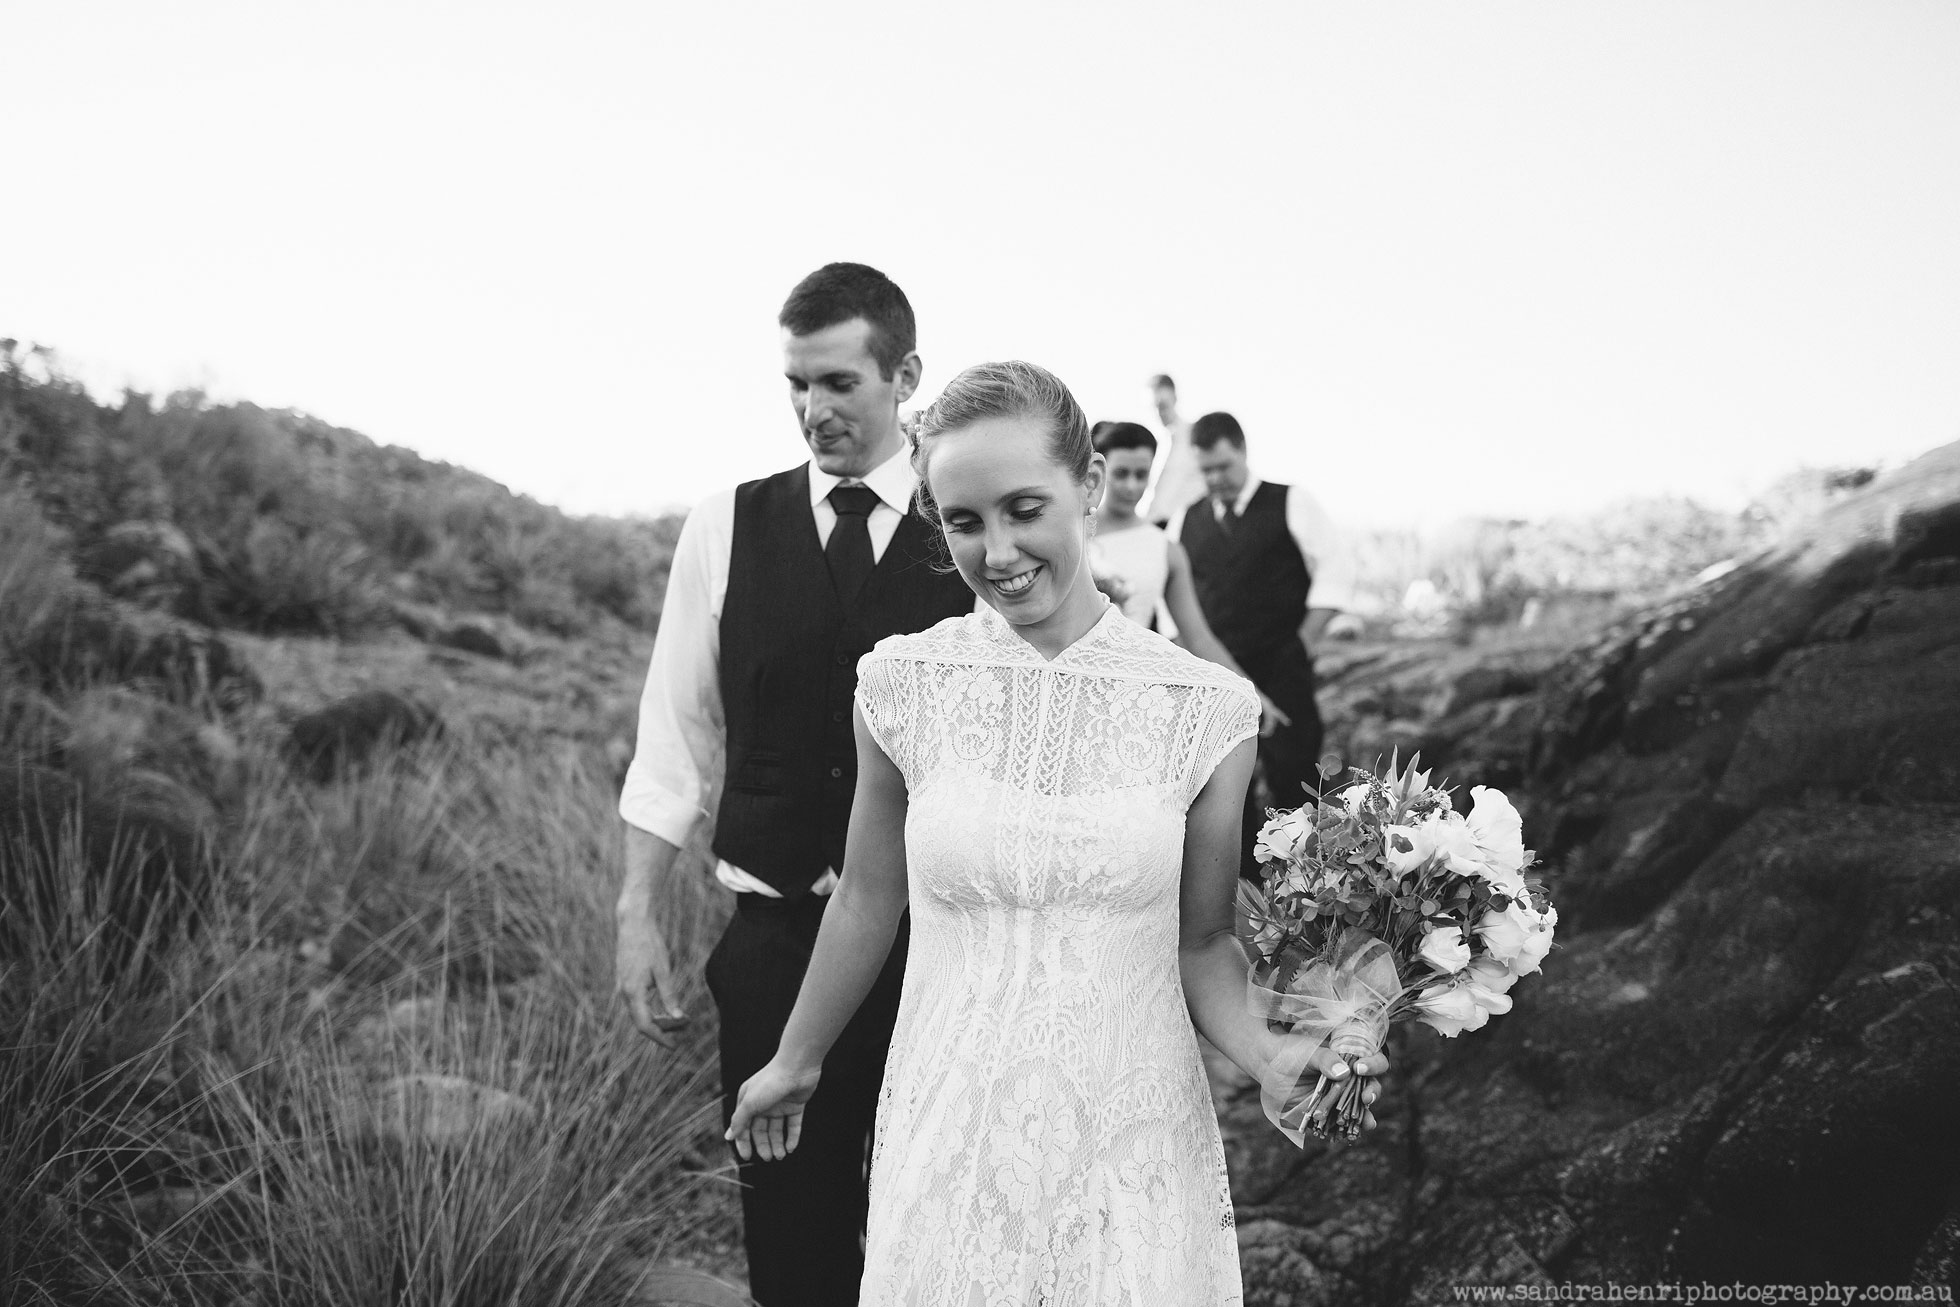 Port-Stephens-Wedding-Photographer-Central-Coast-24.jpg